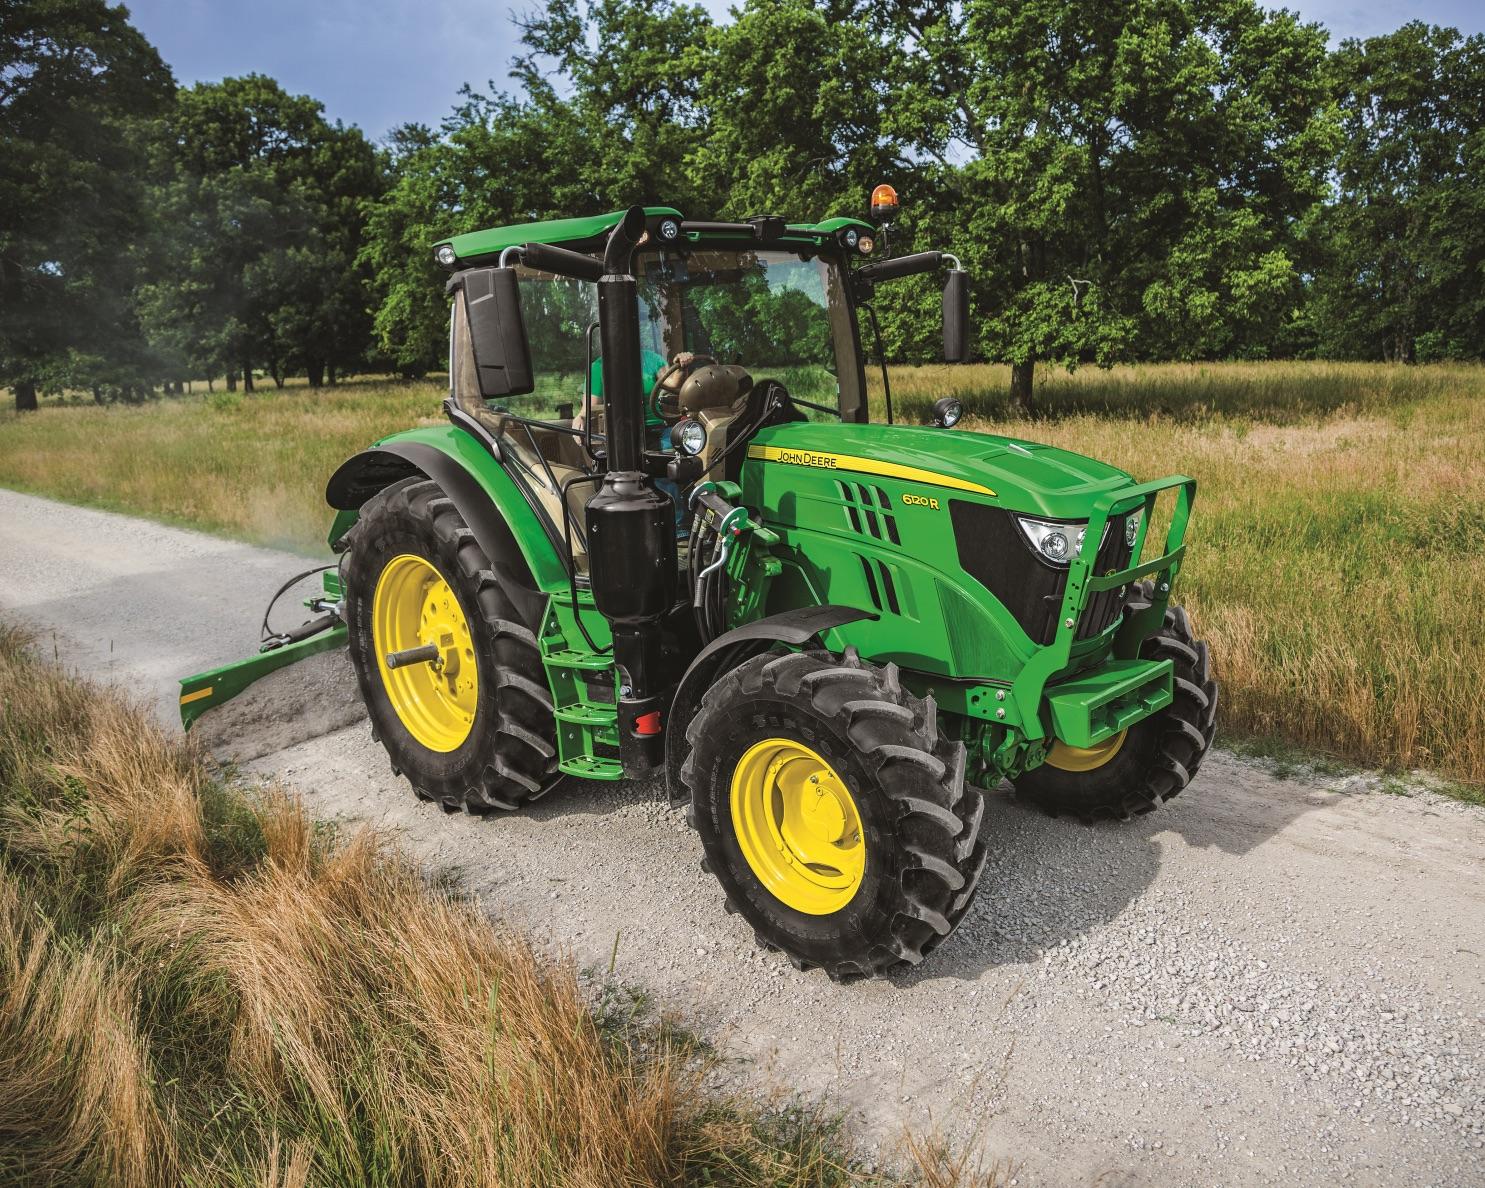 6R Series Utility Tractors